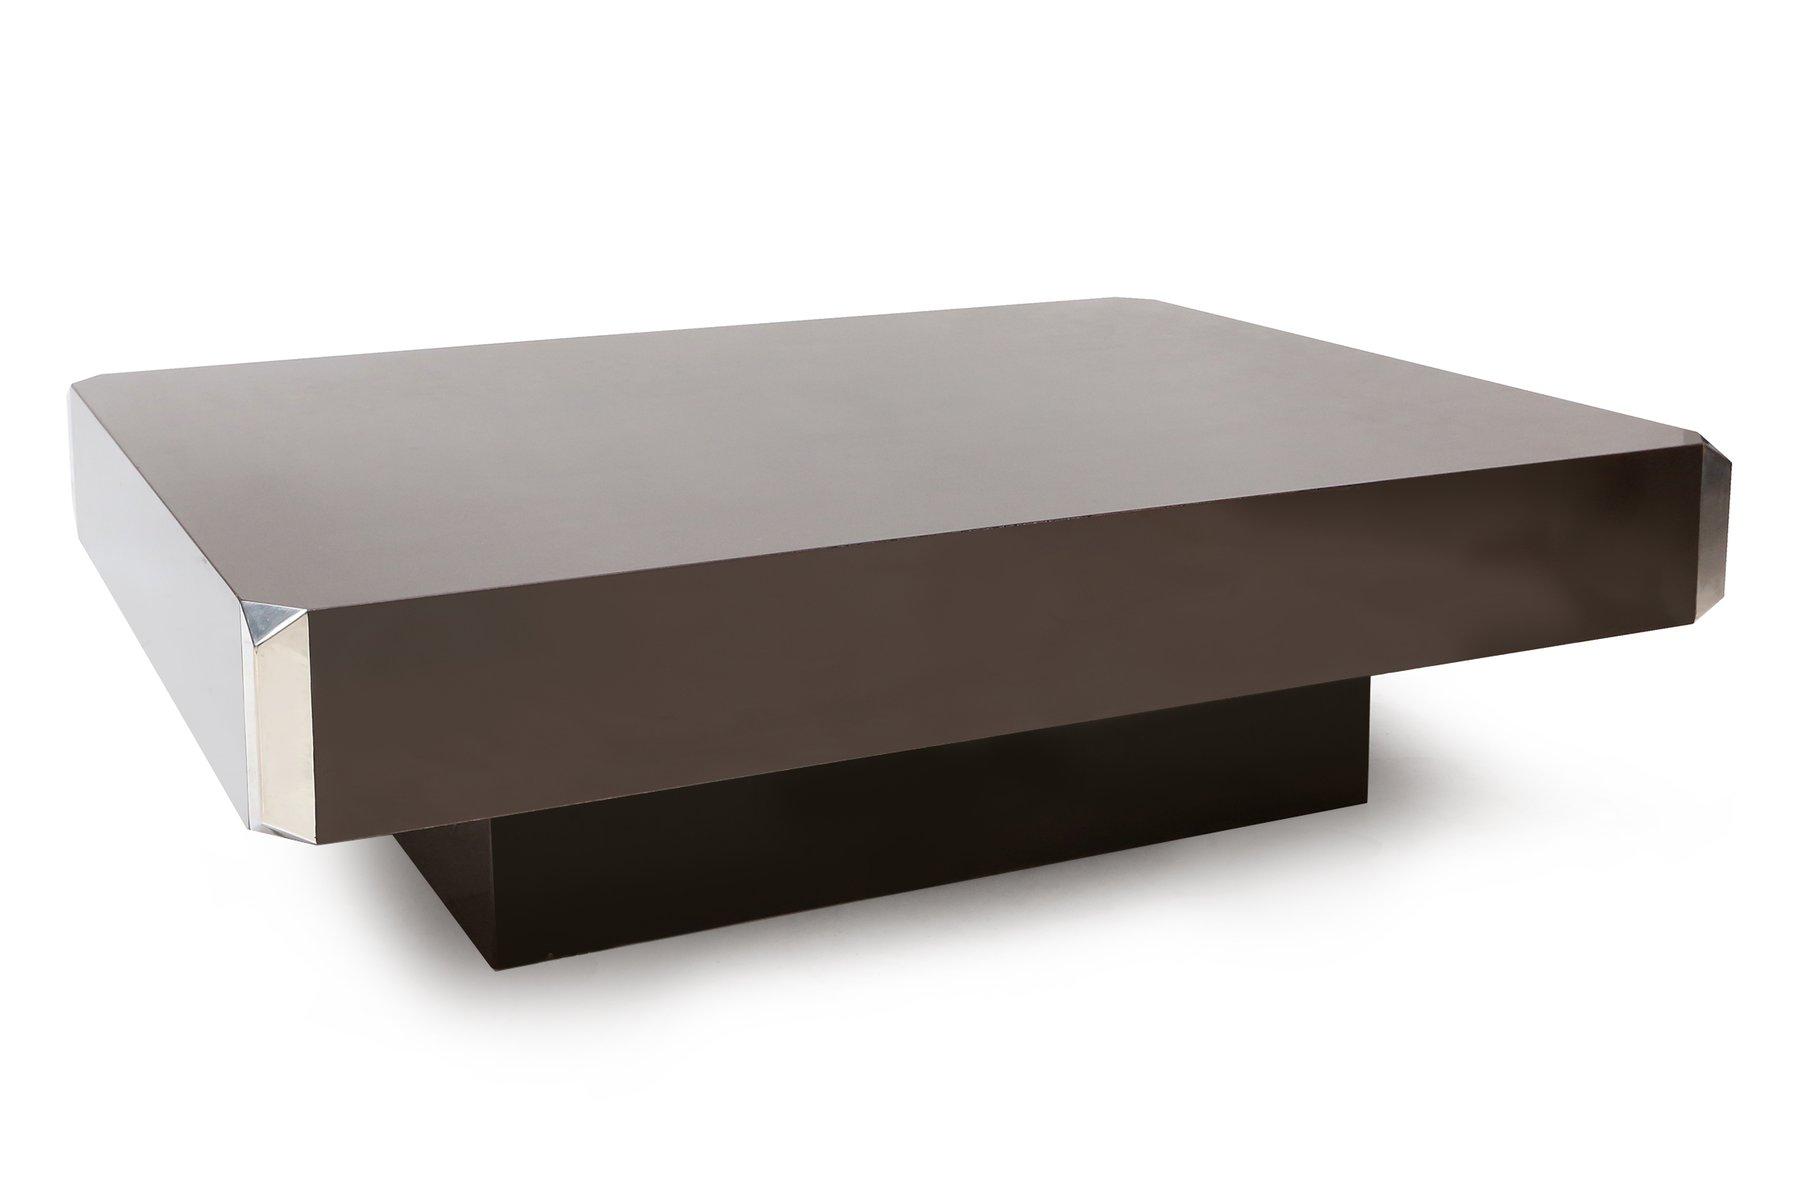 table basse par willy rizzo france 1970s en vente sur pamono. Black Bedroom Furniture Sets. Home Design Ideas